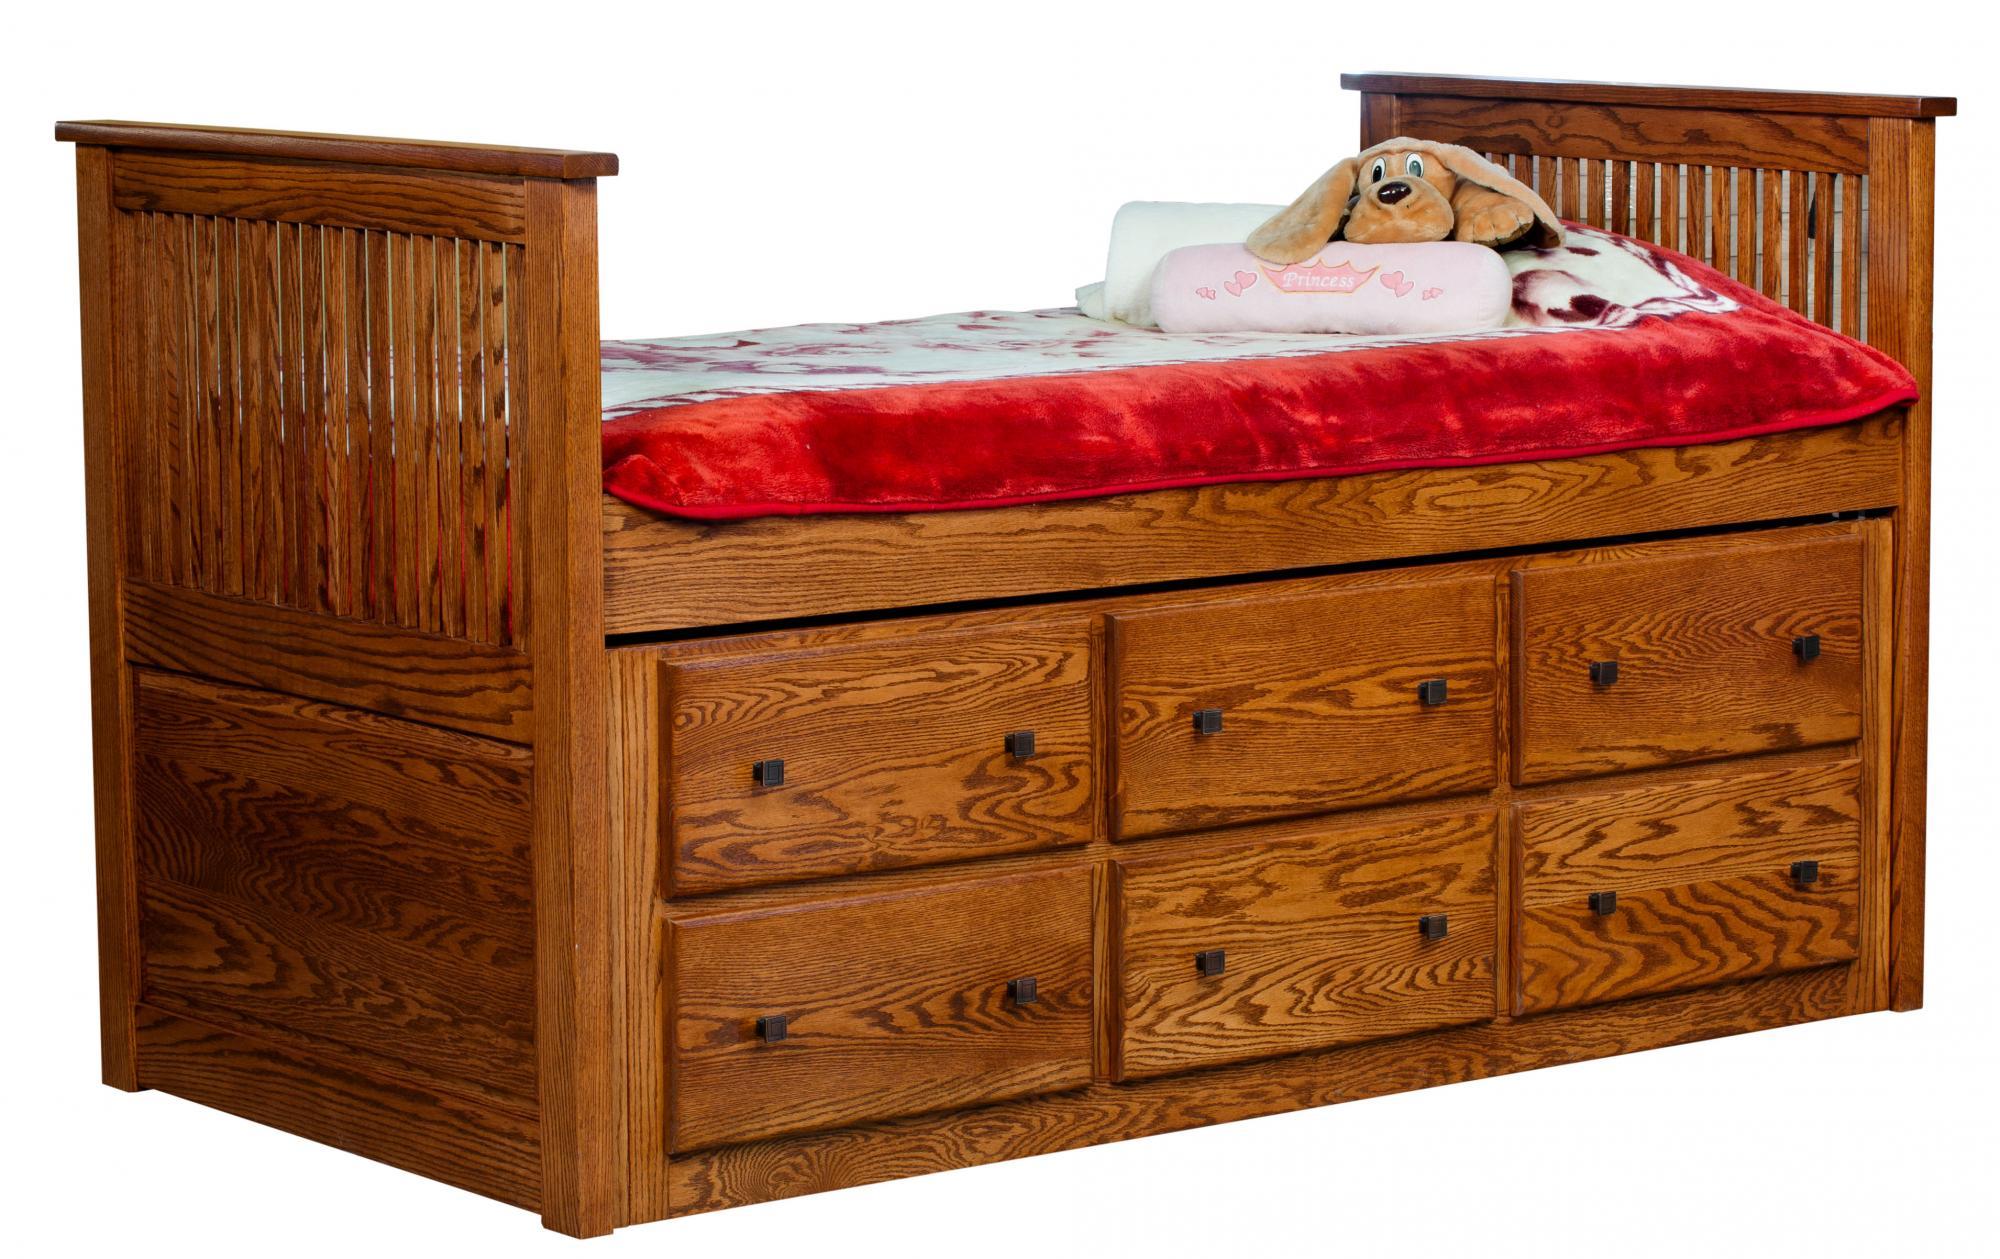 Captain Bed Amish Furniture Store Mankato MN